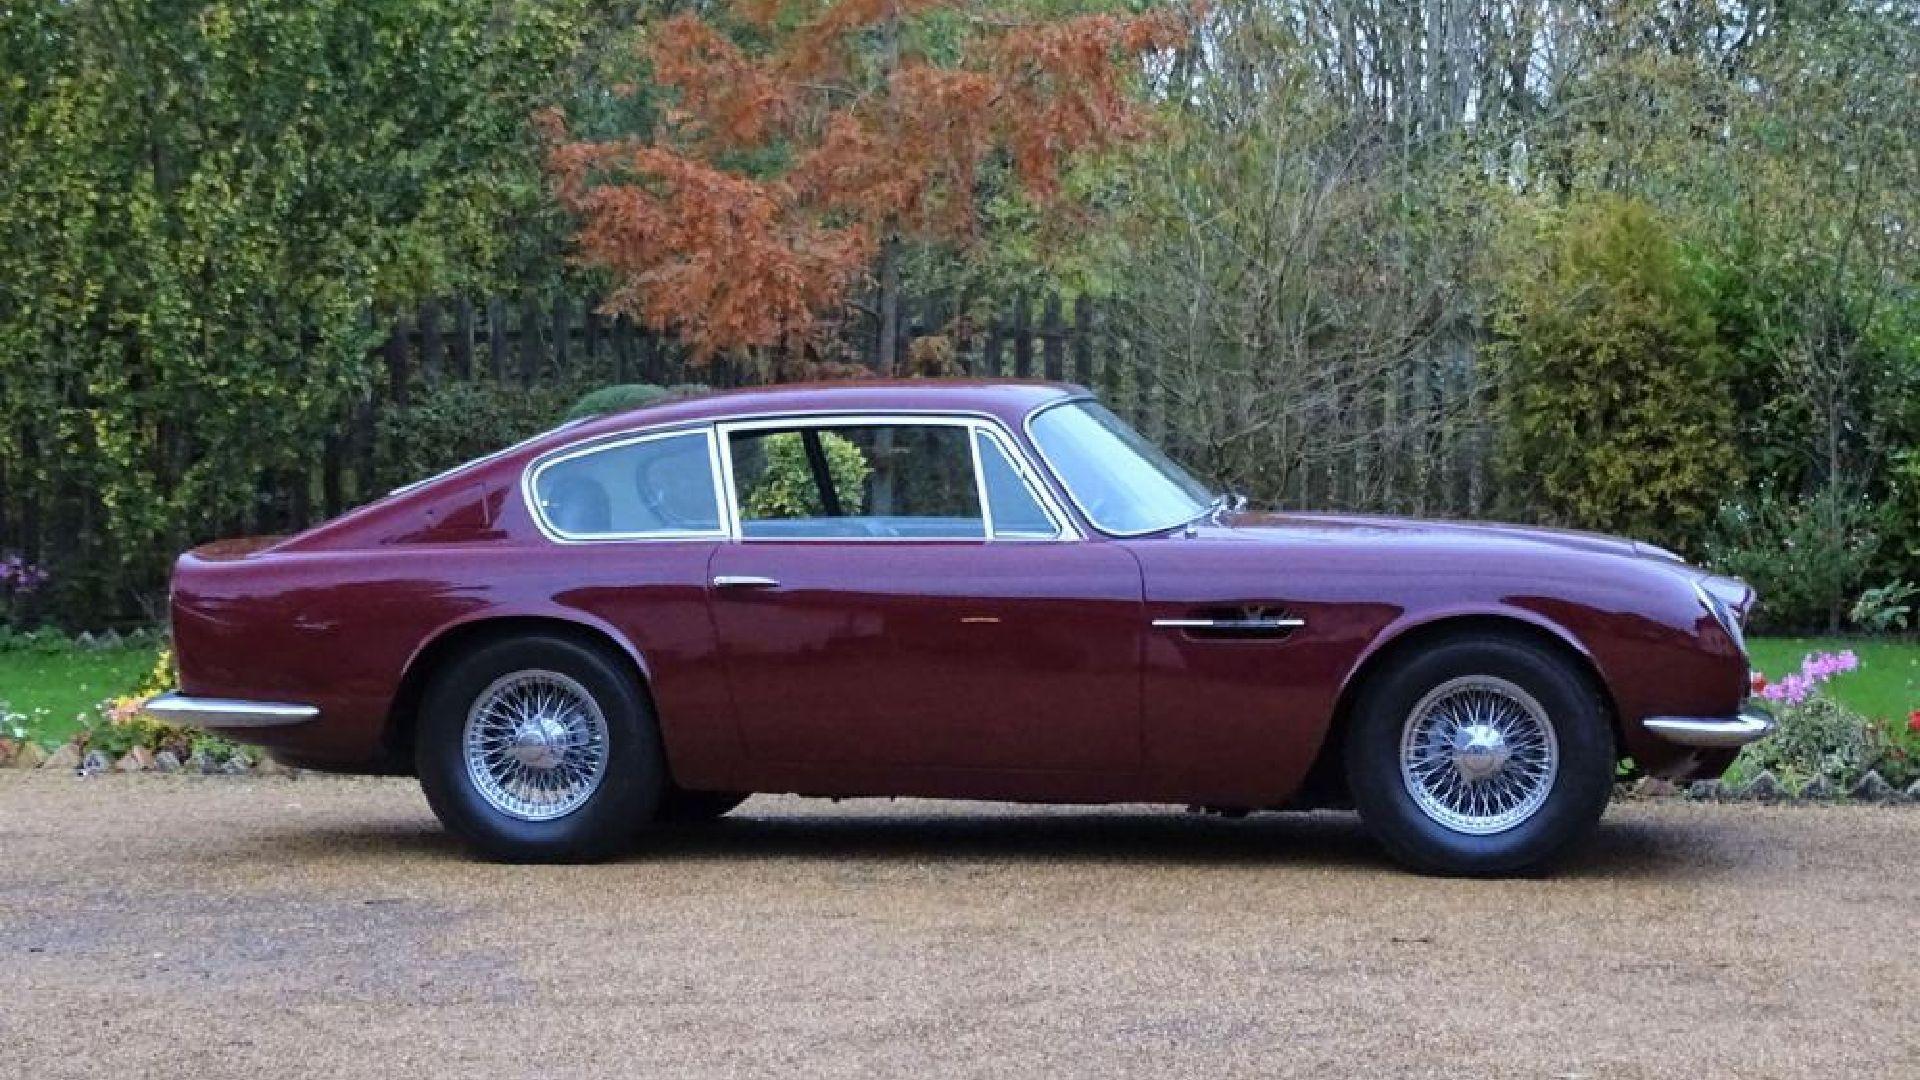 Aston Martin DB6 Prince Charles